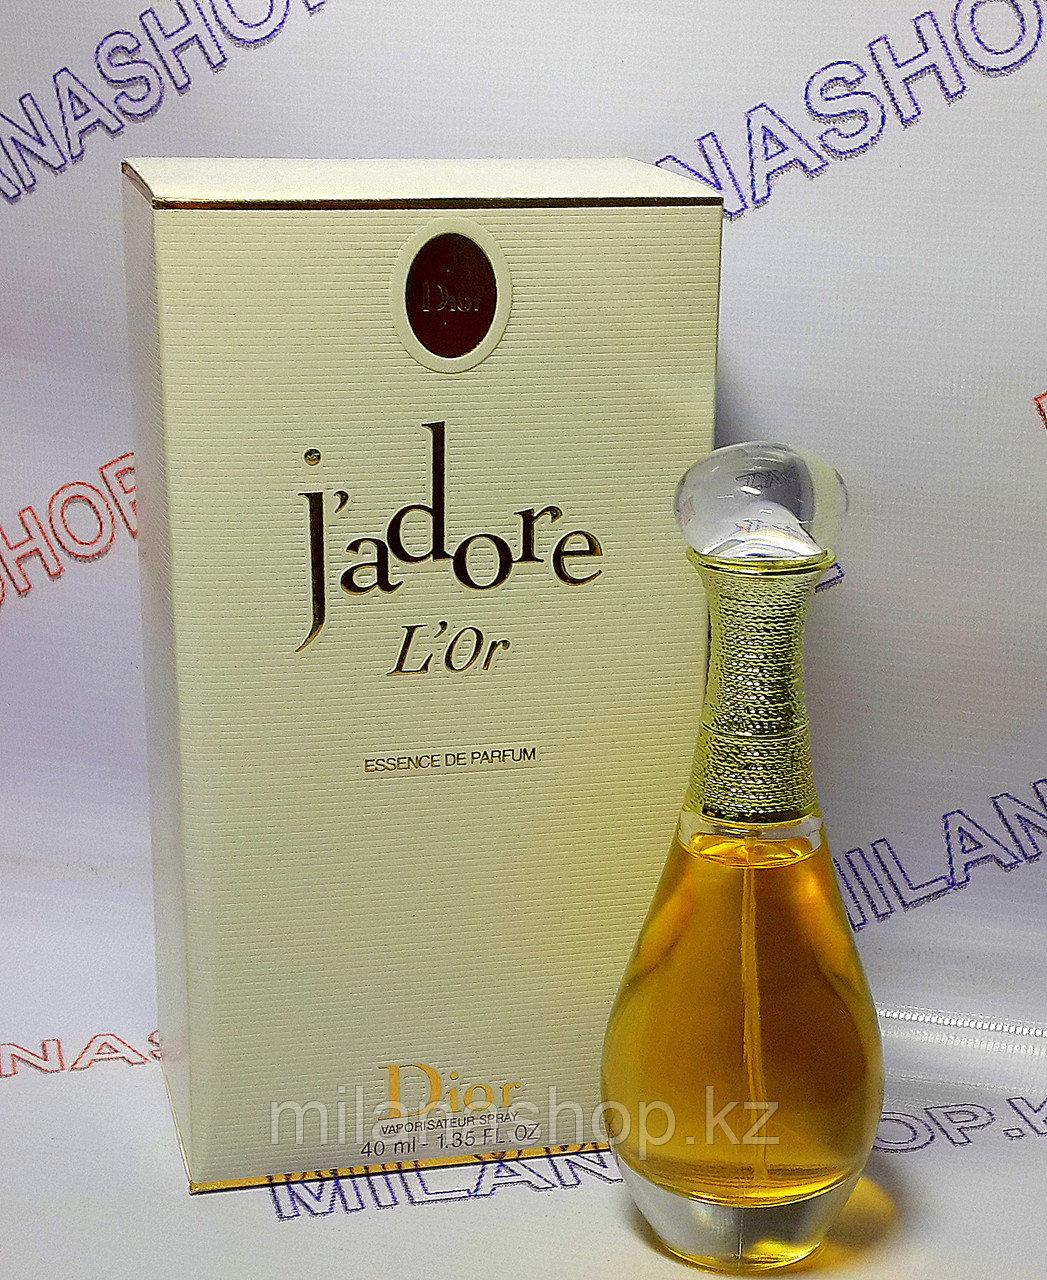 Женские духи J'adore L'or essence Christian Dior ( 50 мг )